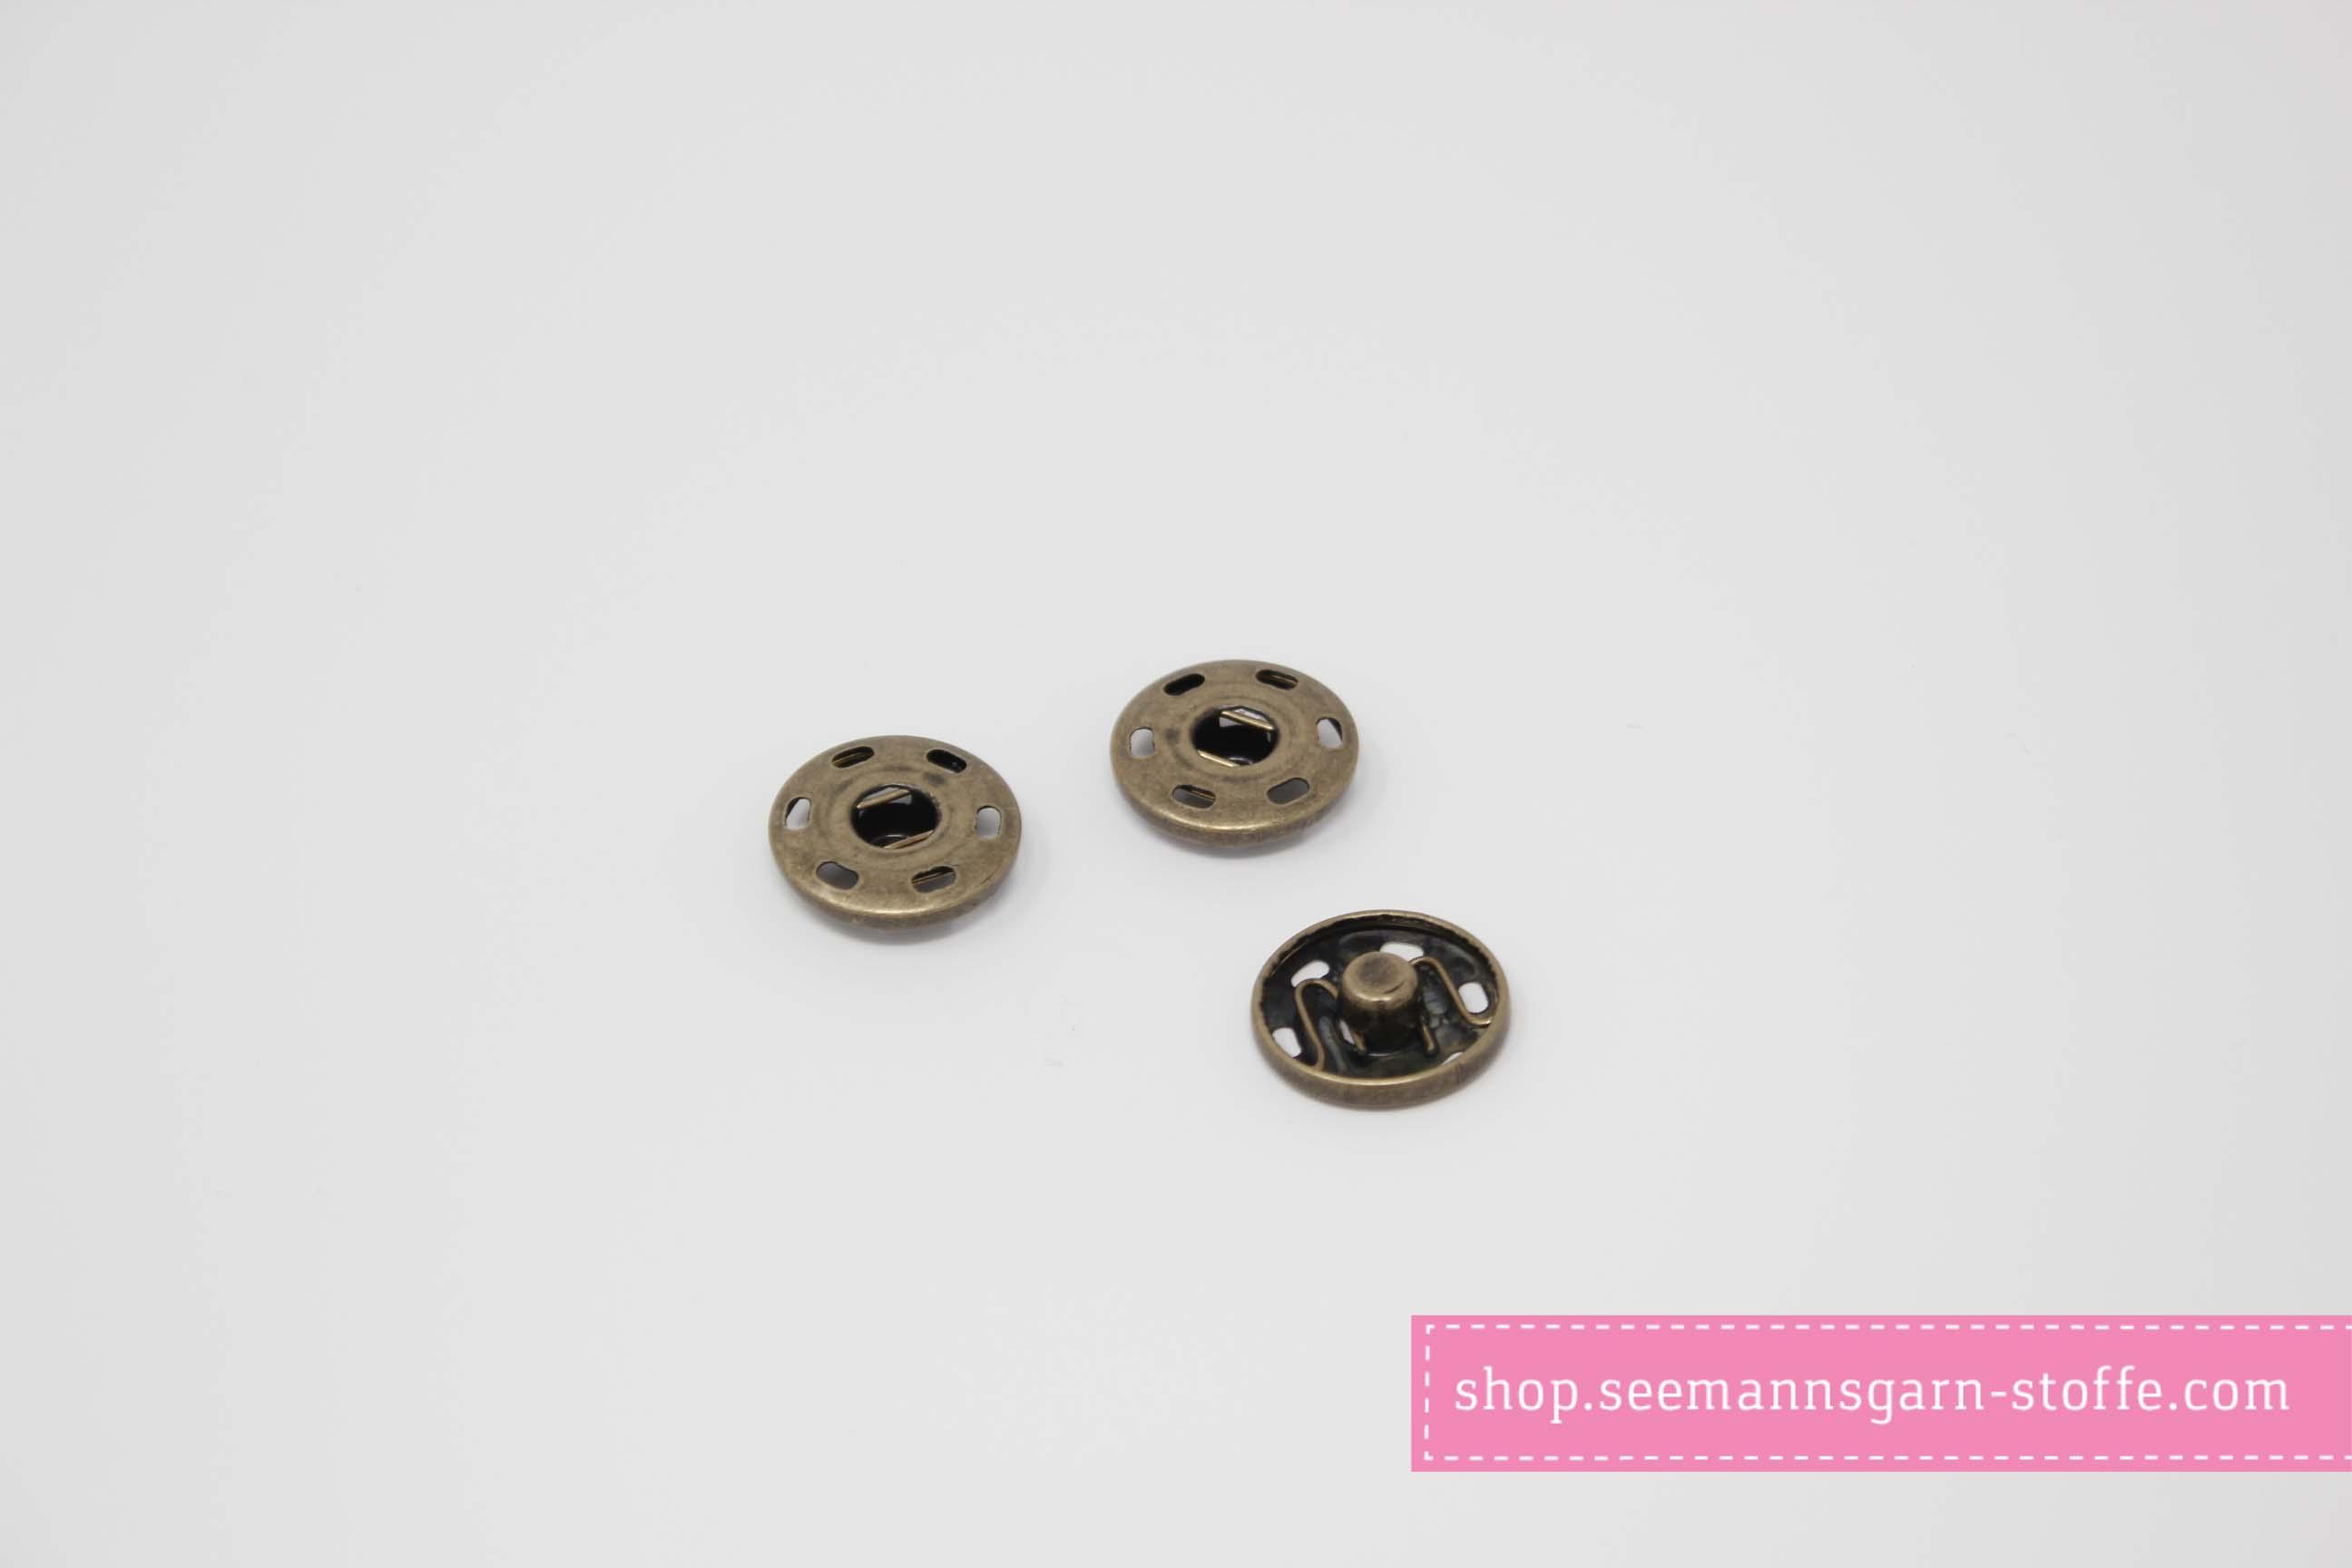 Pompom - weinrot 12 mm mit Druckknopf